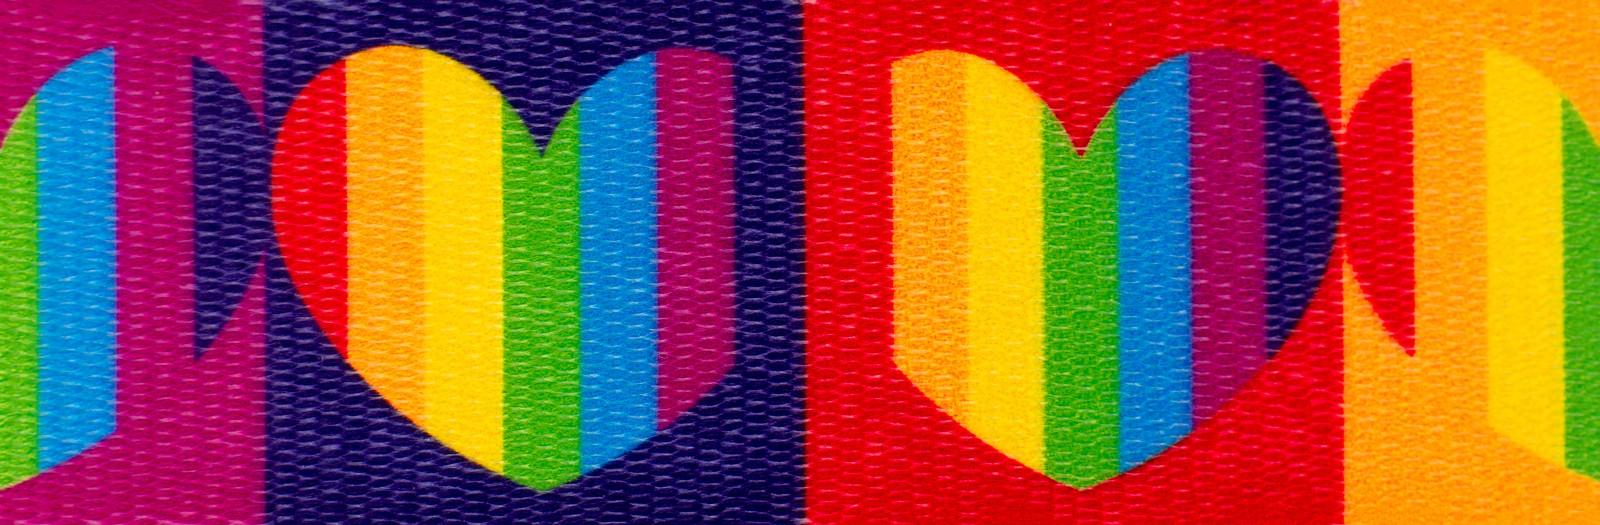 wpe-rbh---rainbow-hearts-polyester-webbing_14.jpg